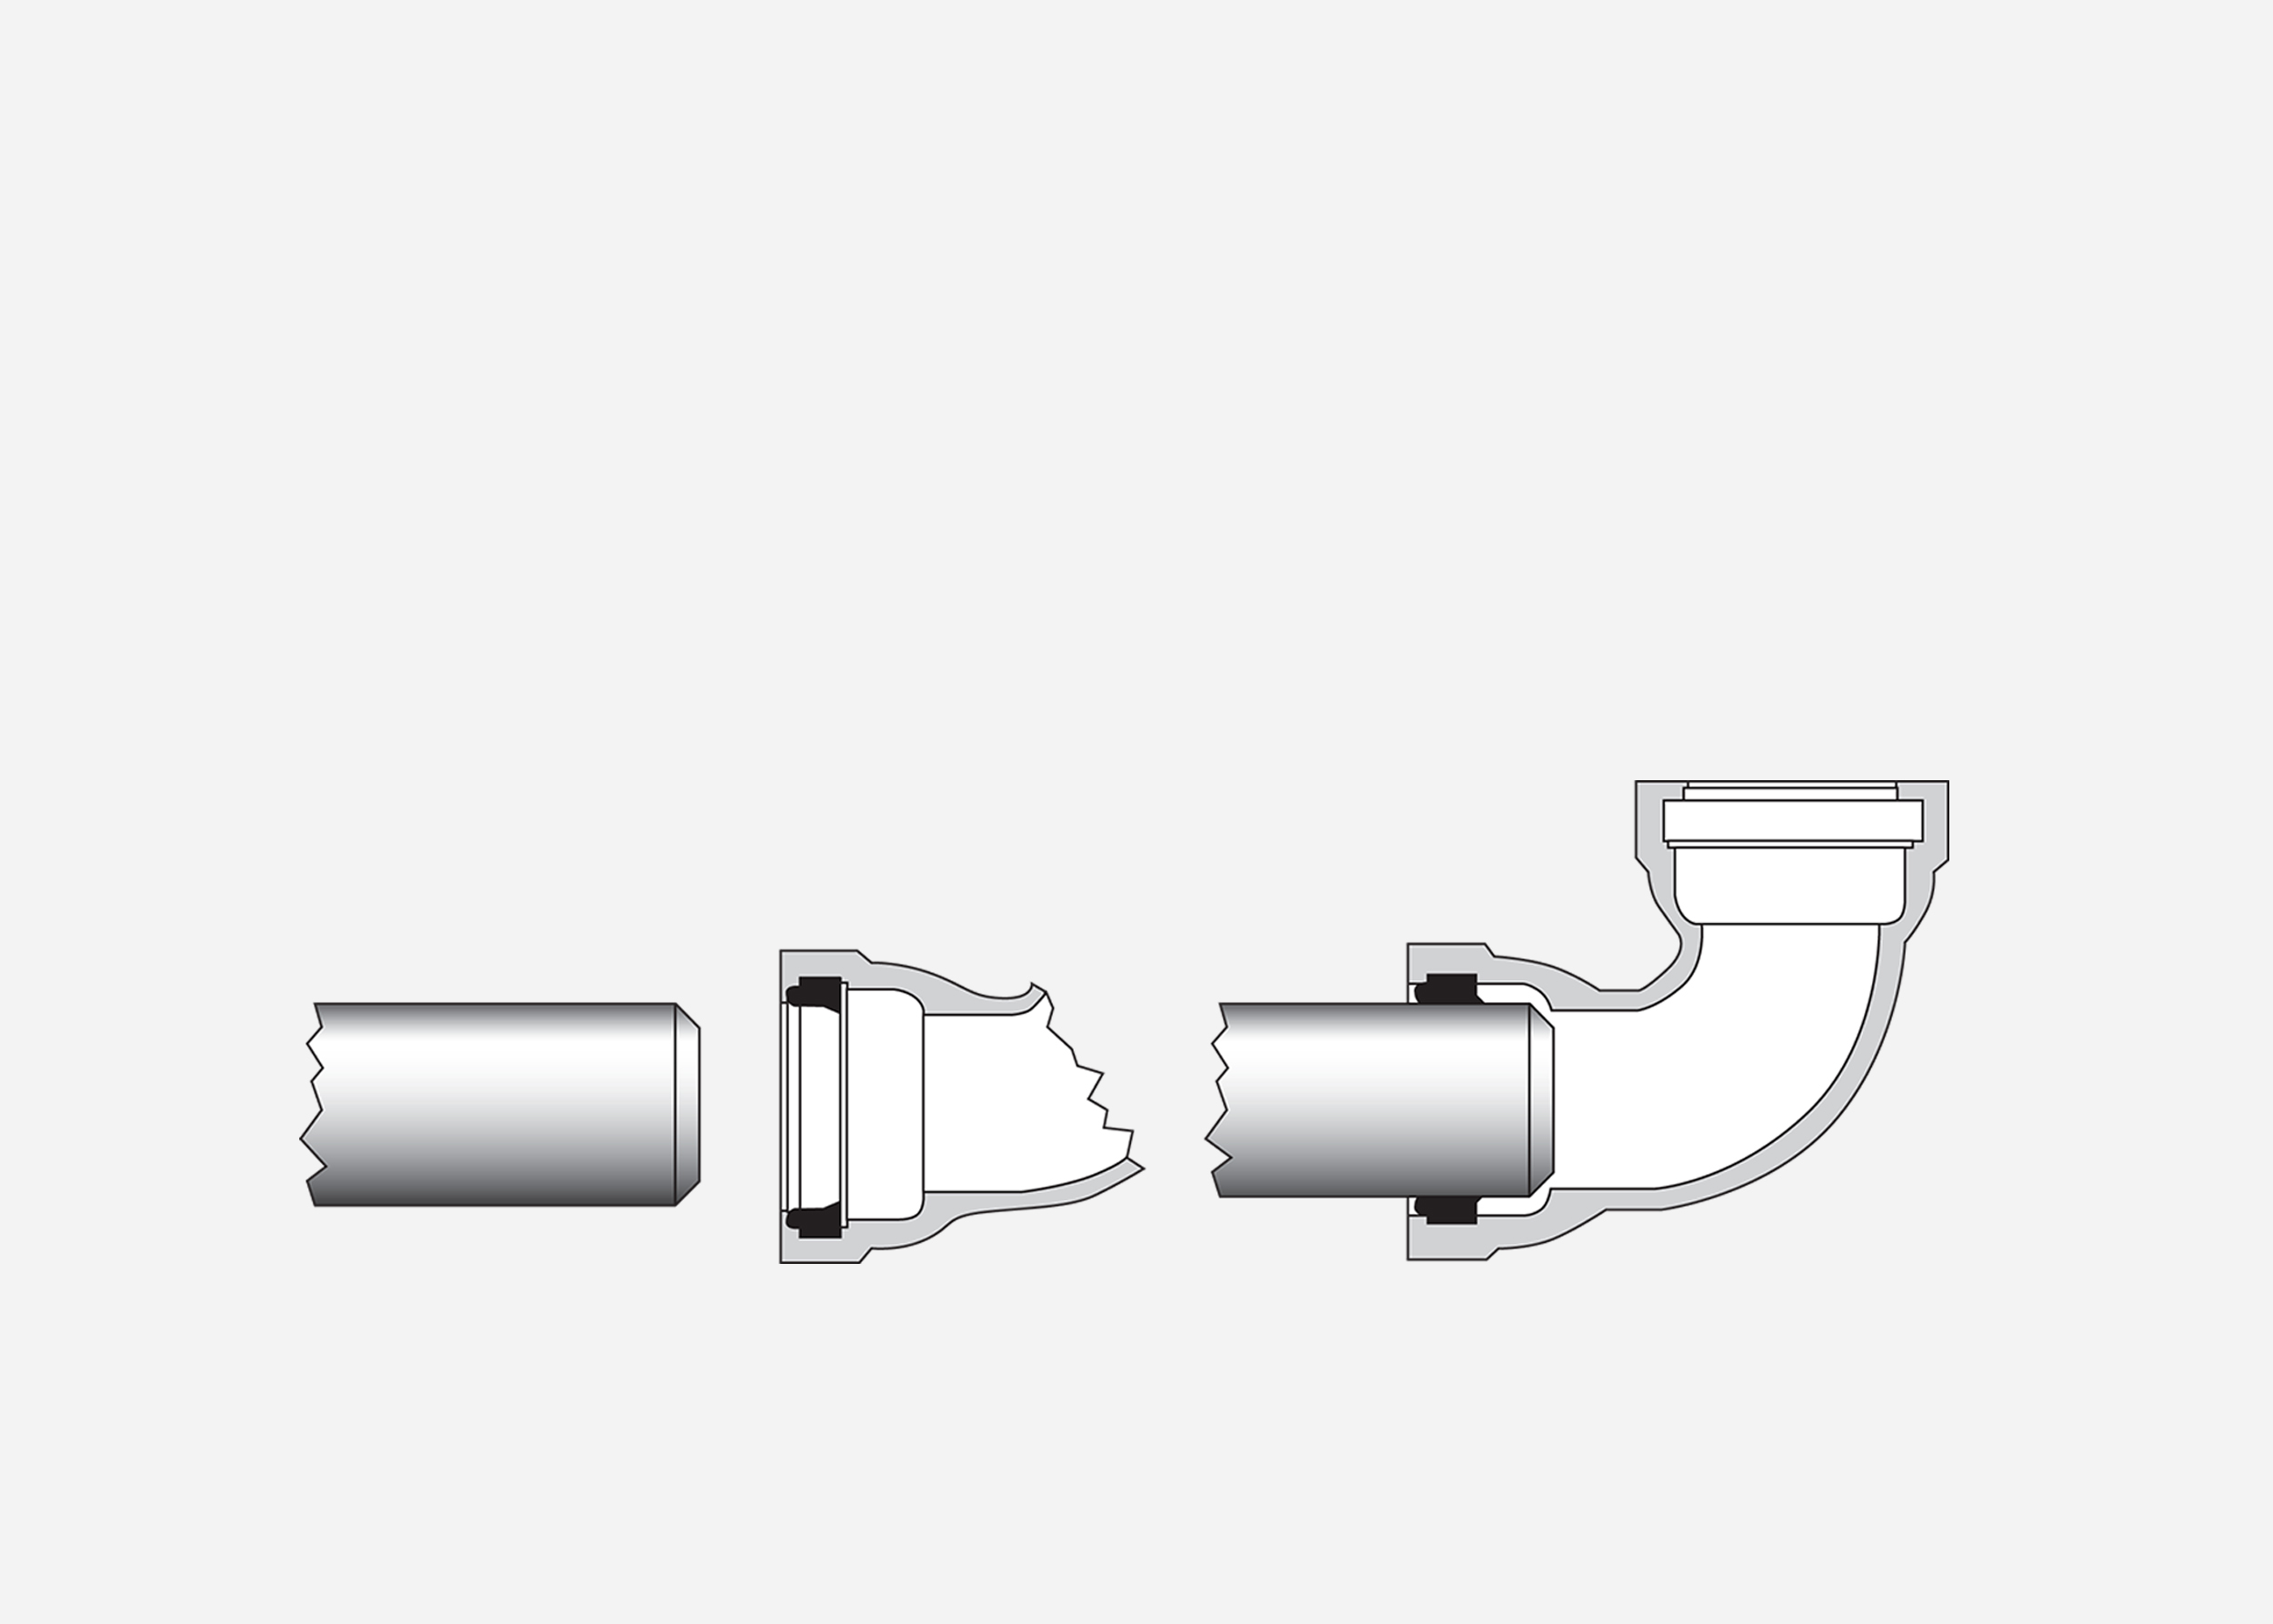 A-C Trans Gasket Drawing.jpg